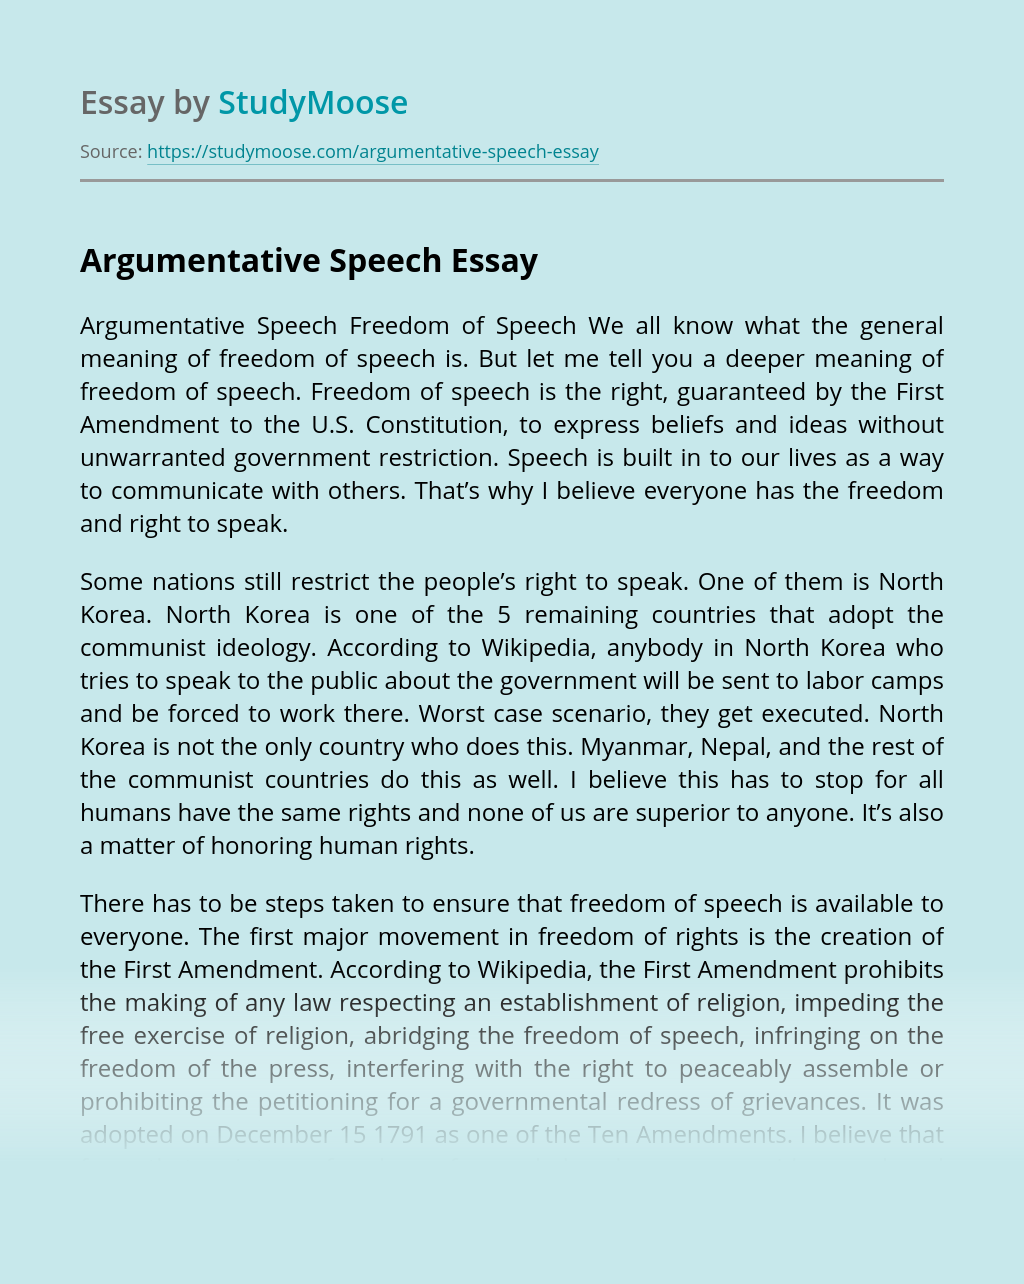 Argumentative Speech